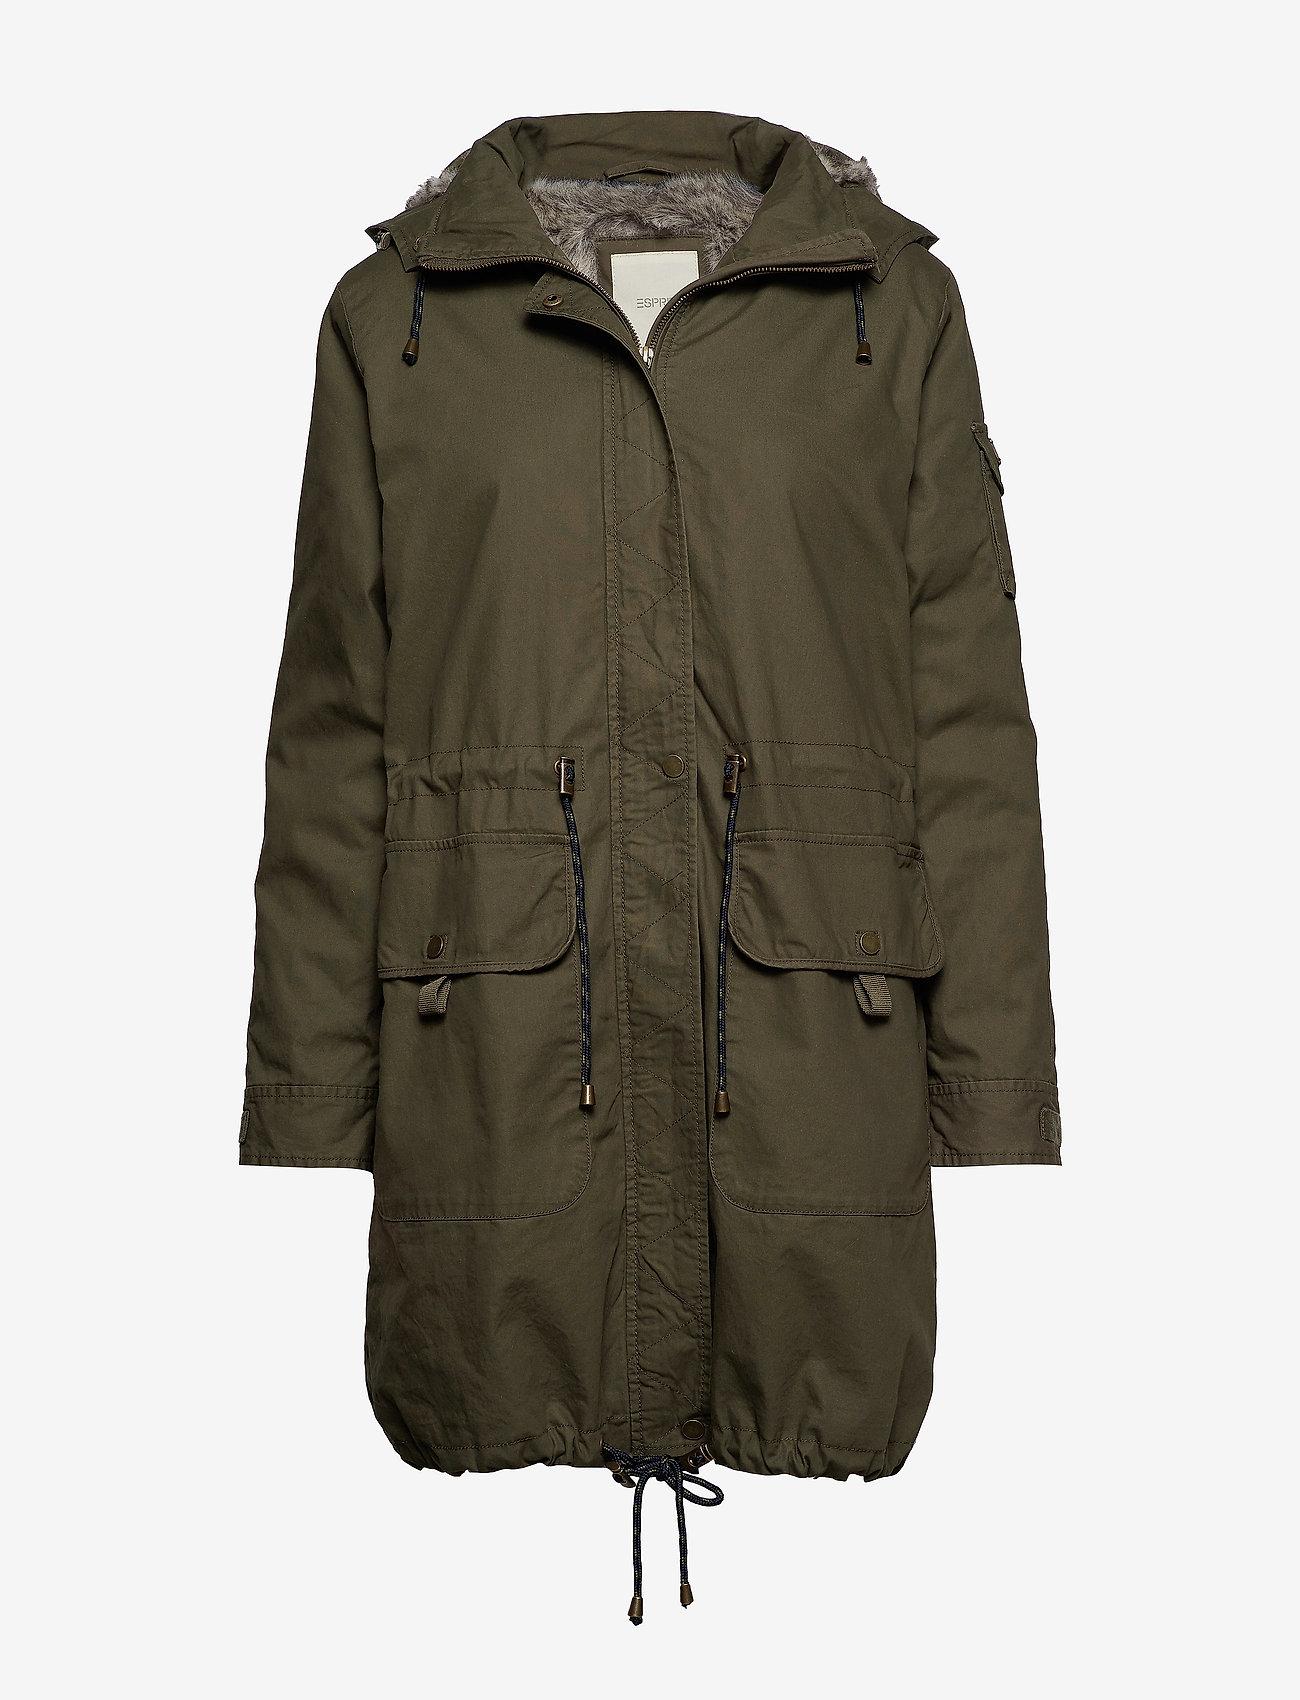 Esprit Casual - Coats woven - khaki green - 1